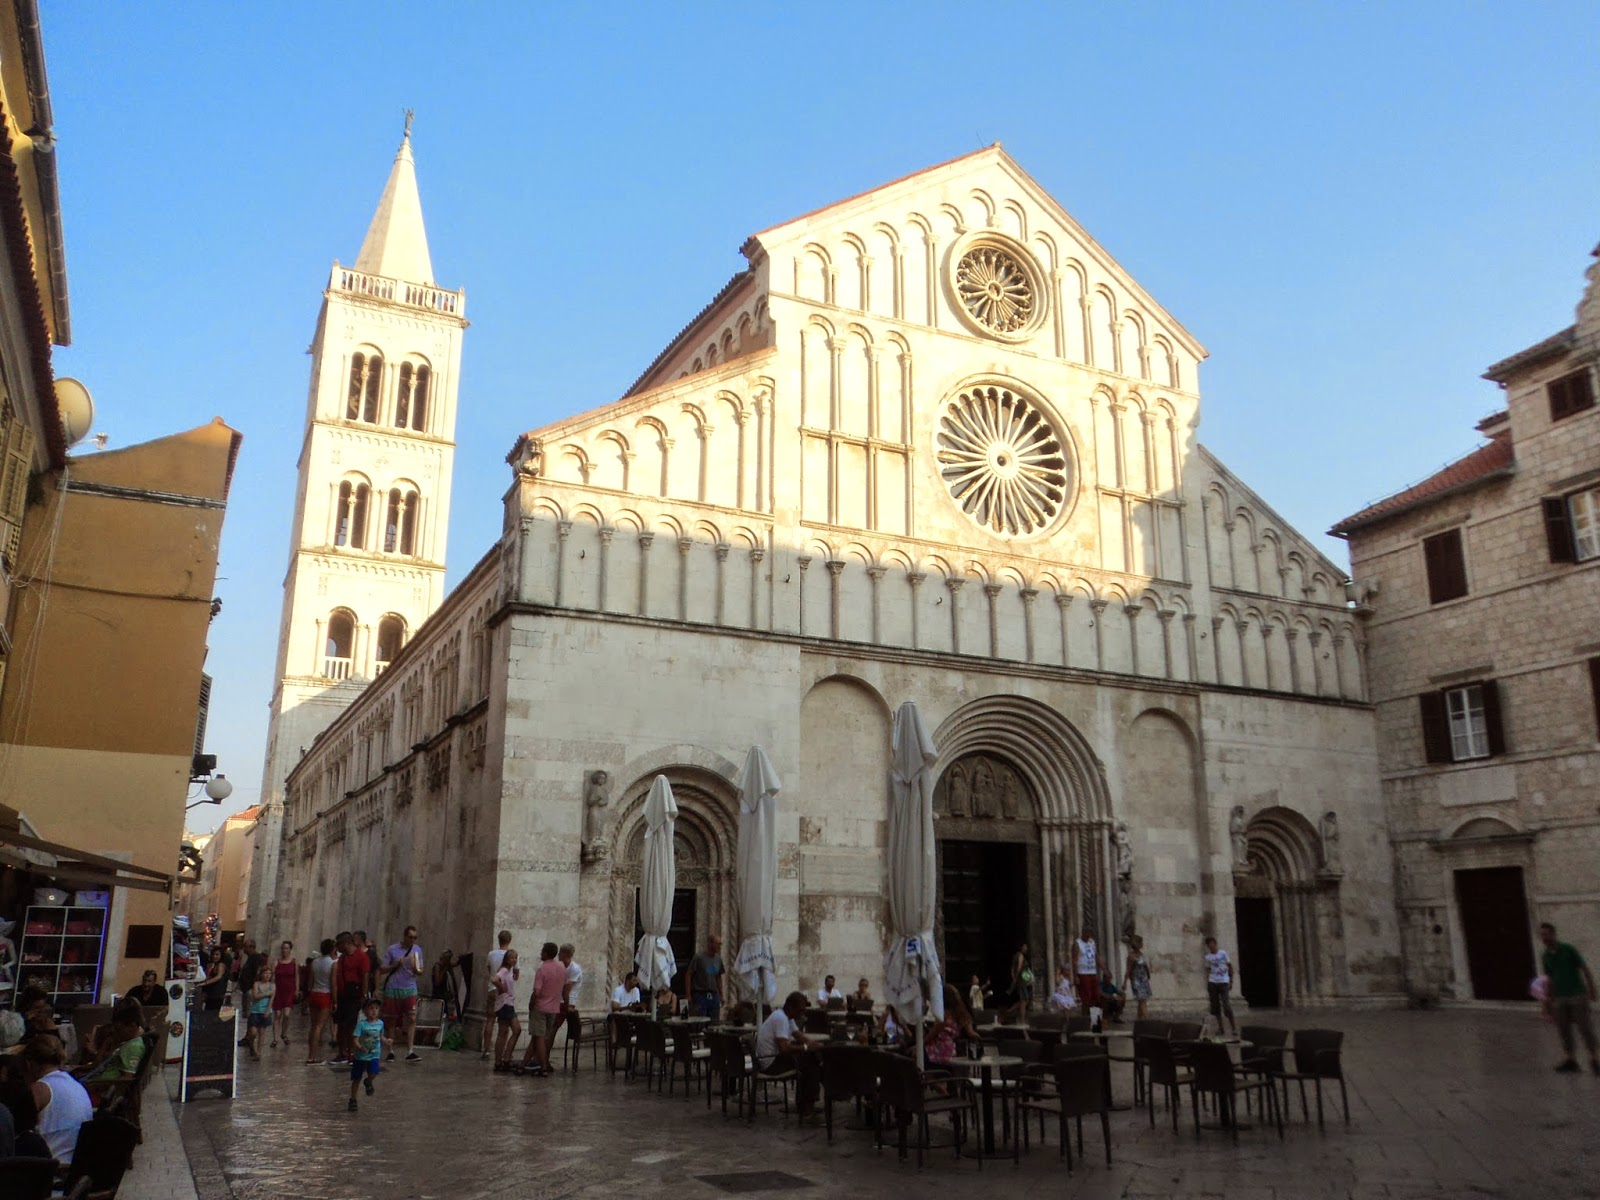 Susurros: Coimbra